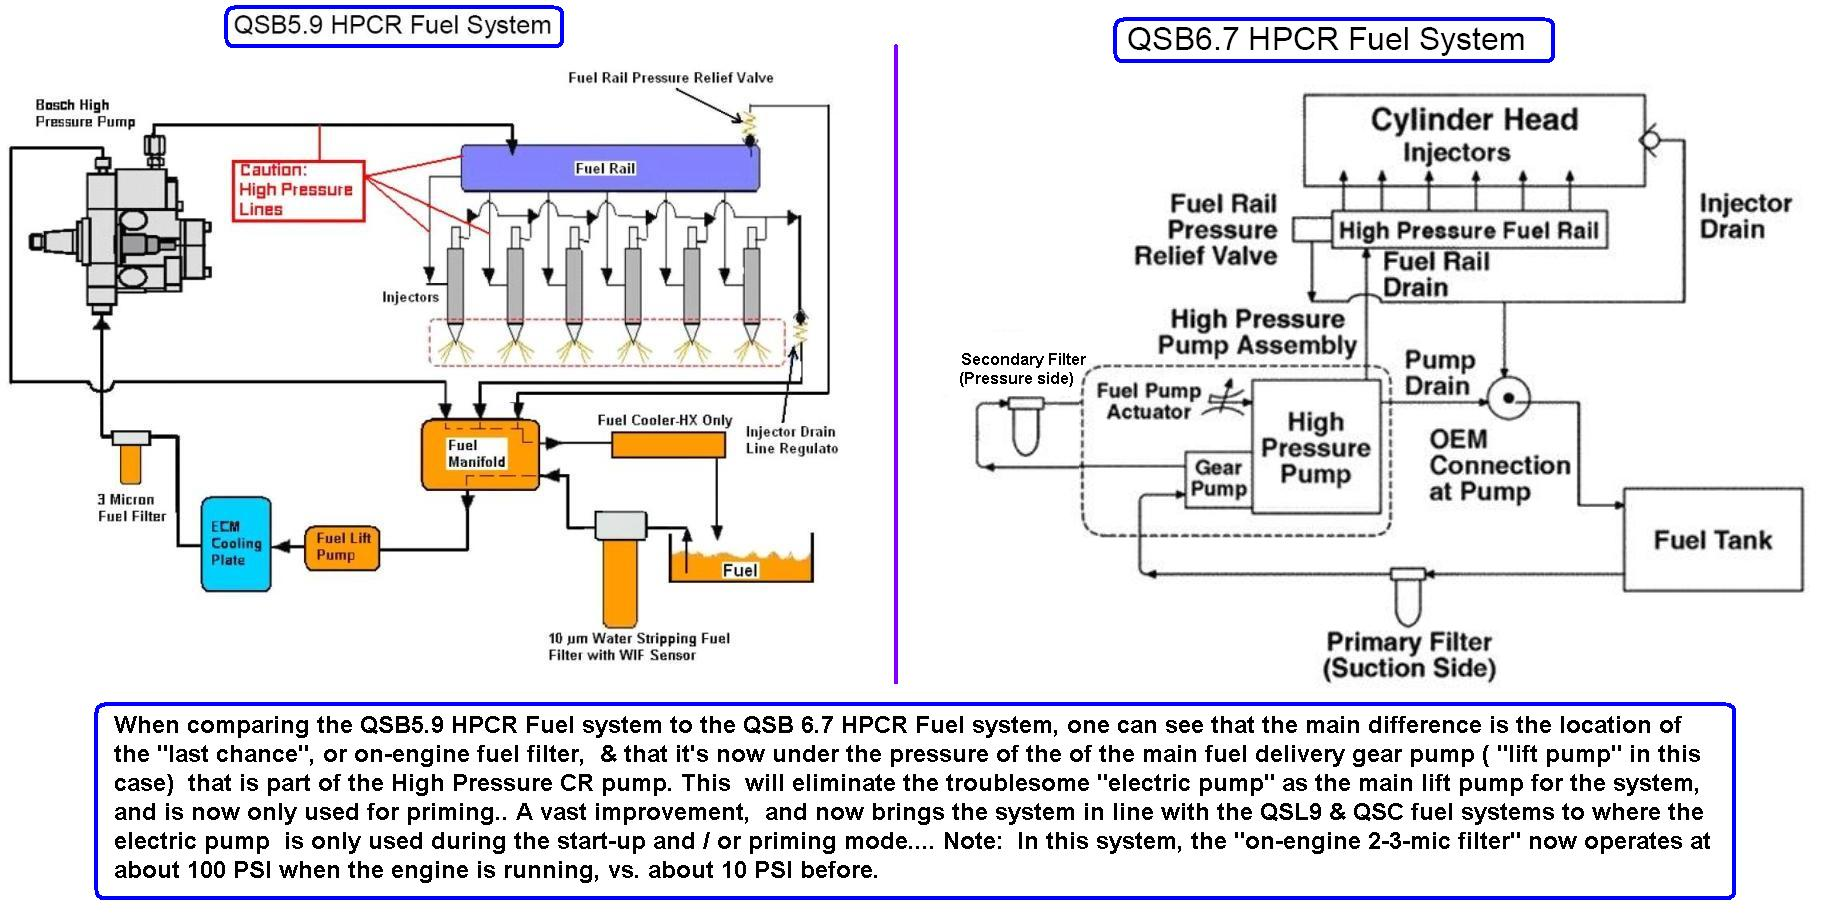 diesel engine starter diagram travel trailer battery wiring 7 3 powerstroke